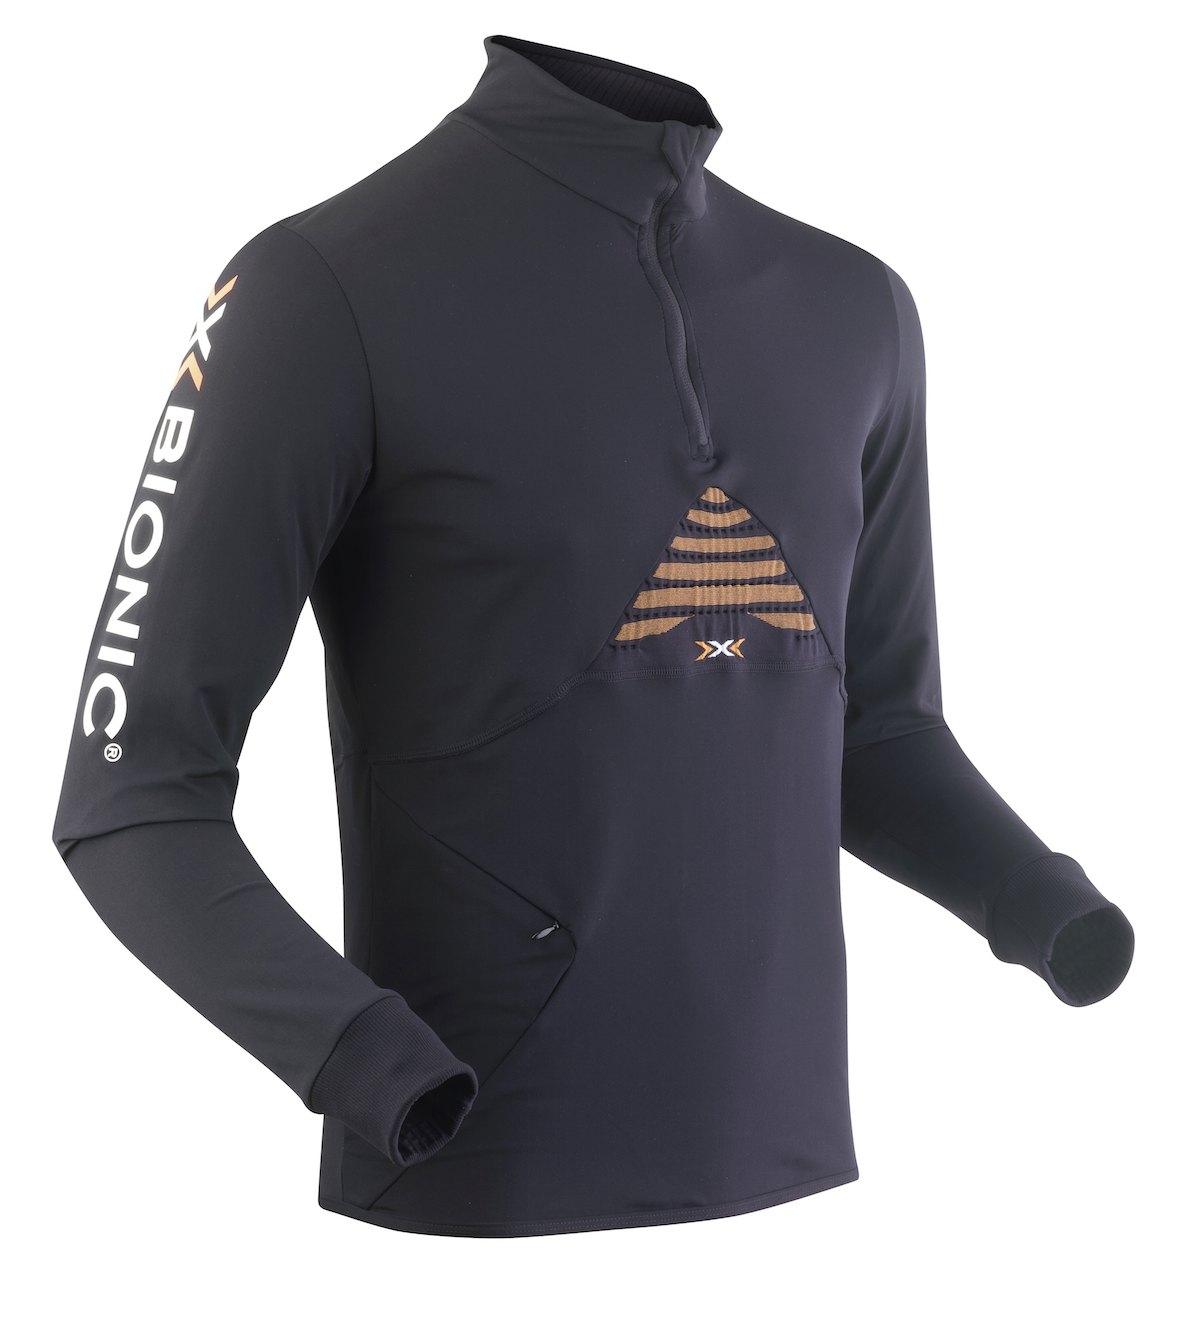 X-Bionic - Trail Running Humdinger manches longues - Camiseta técnica - Hombre